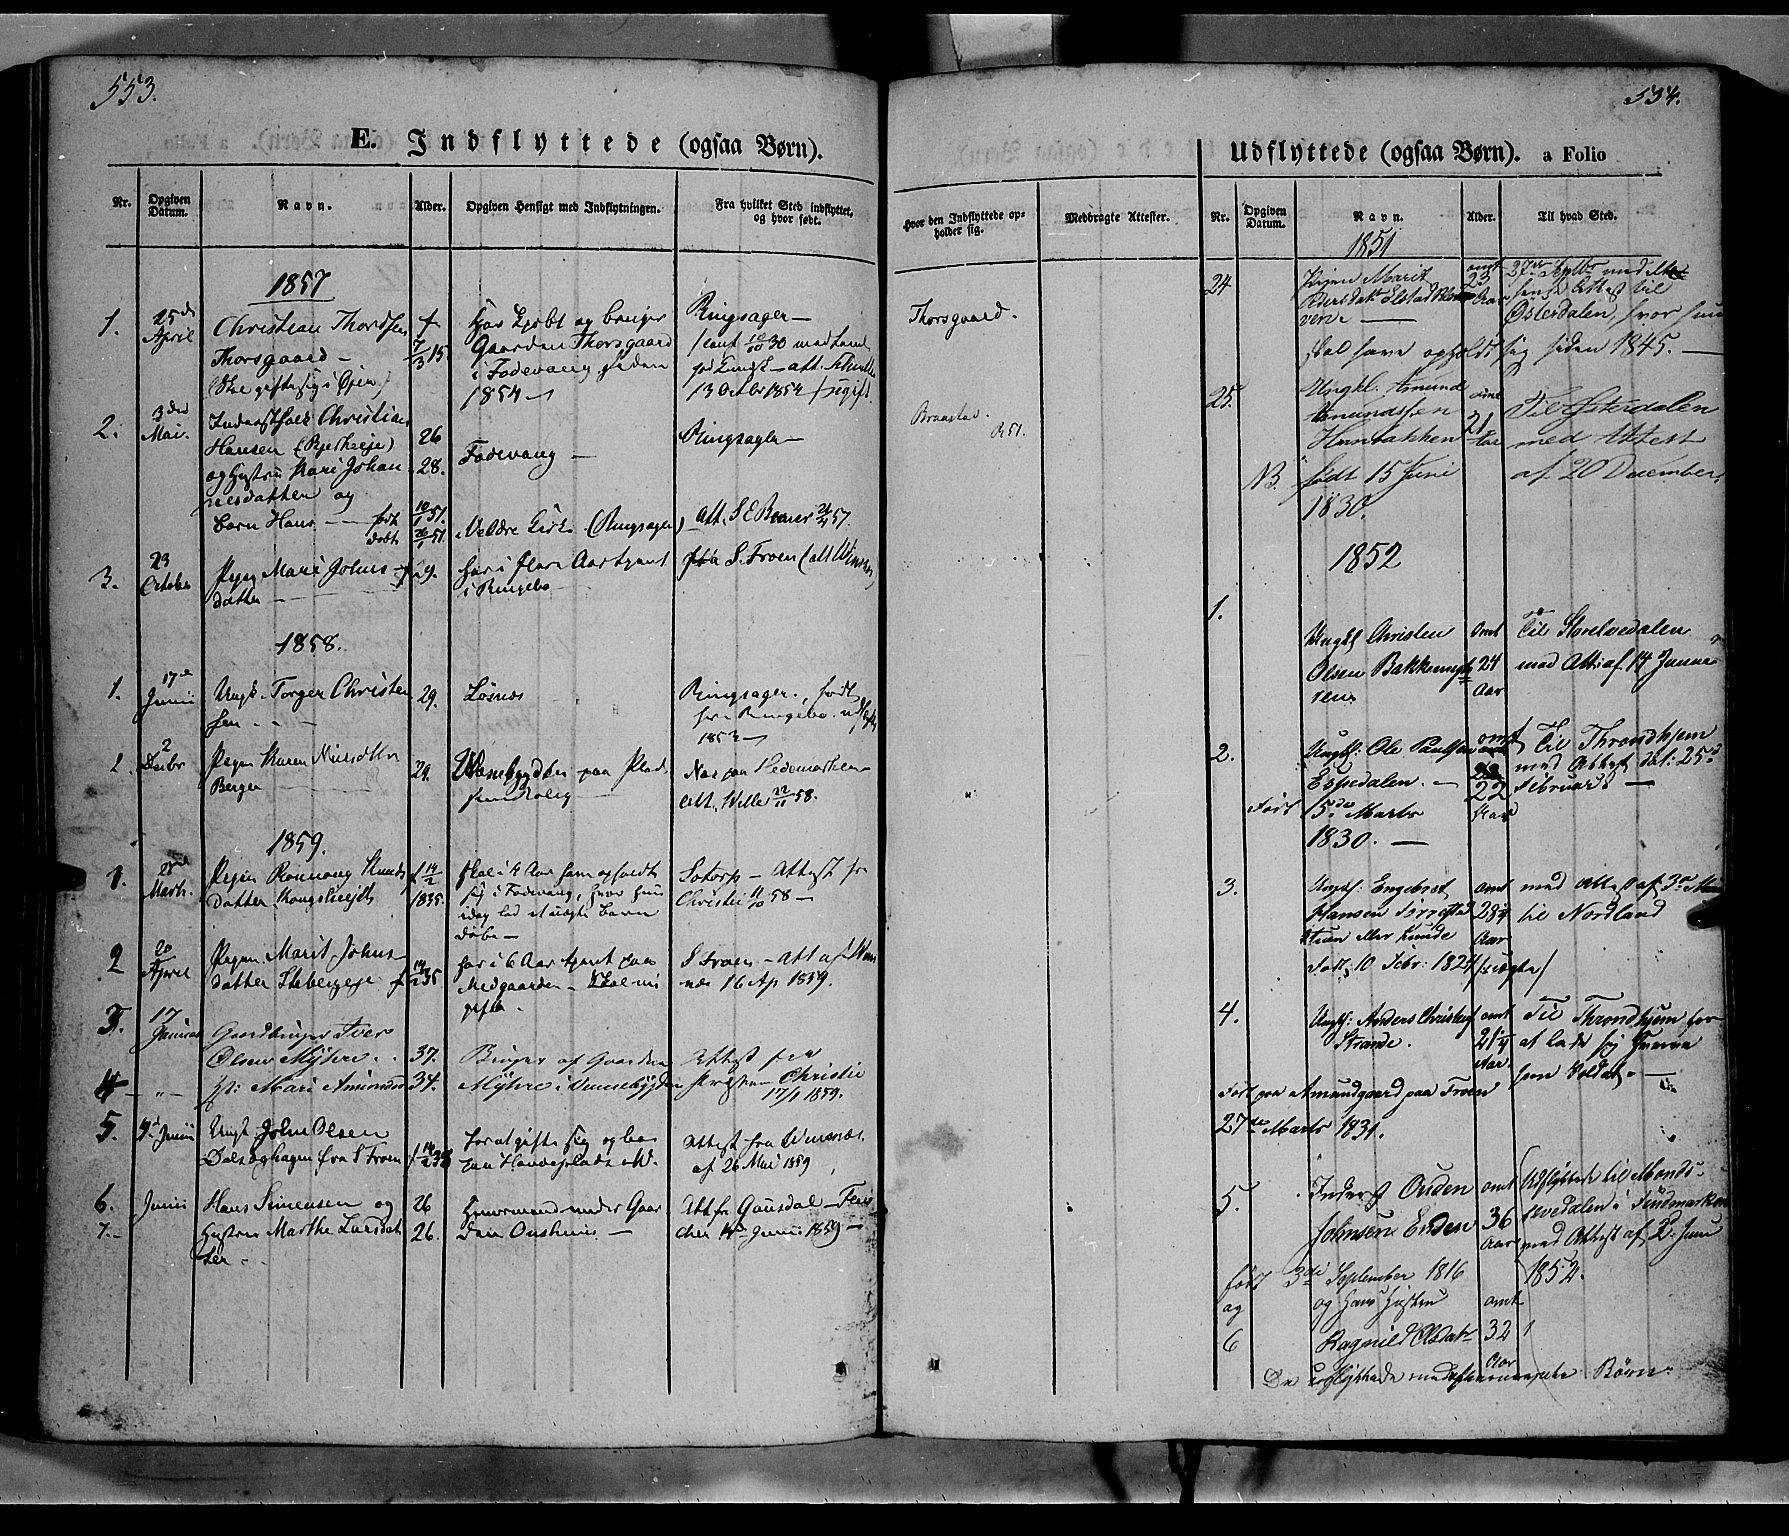 SAH, Ringebu prestekontor, Ministerialbok nr. 6, 1848-1859, s. 553-554